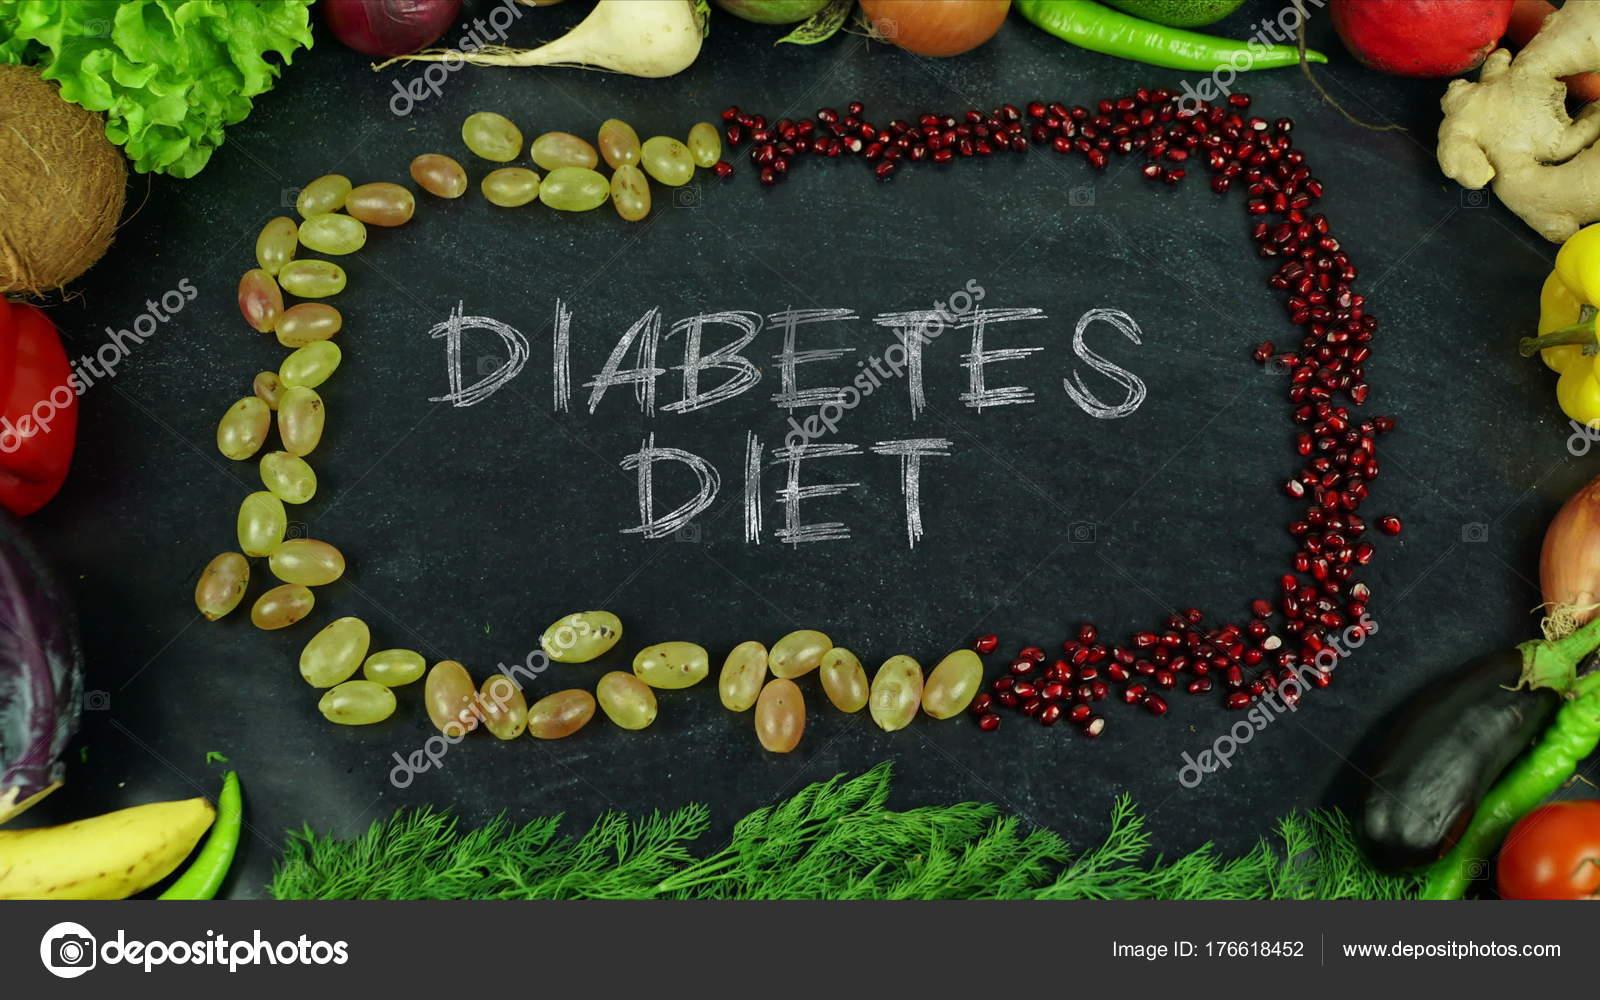 Diabetes diet fruit stop motion Stock Photo ankabala 176618452